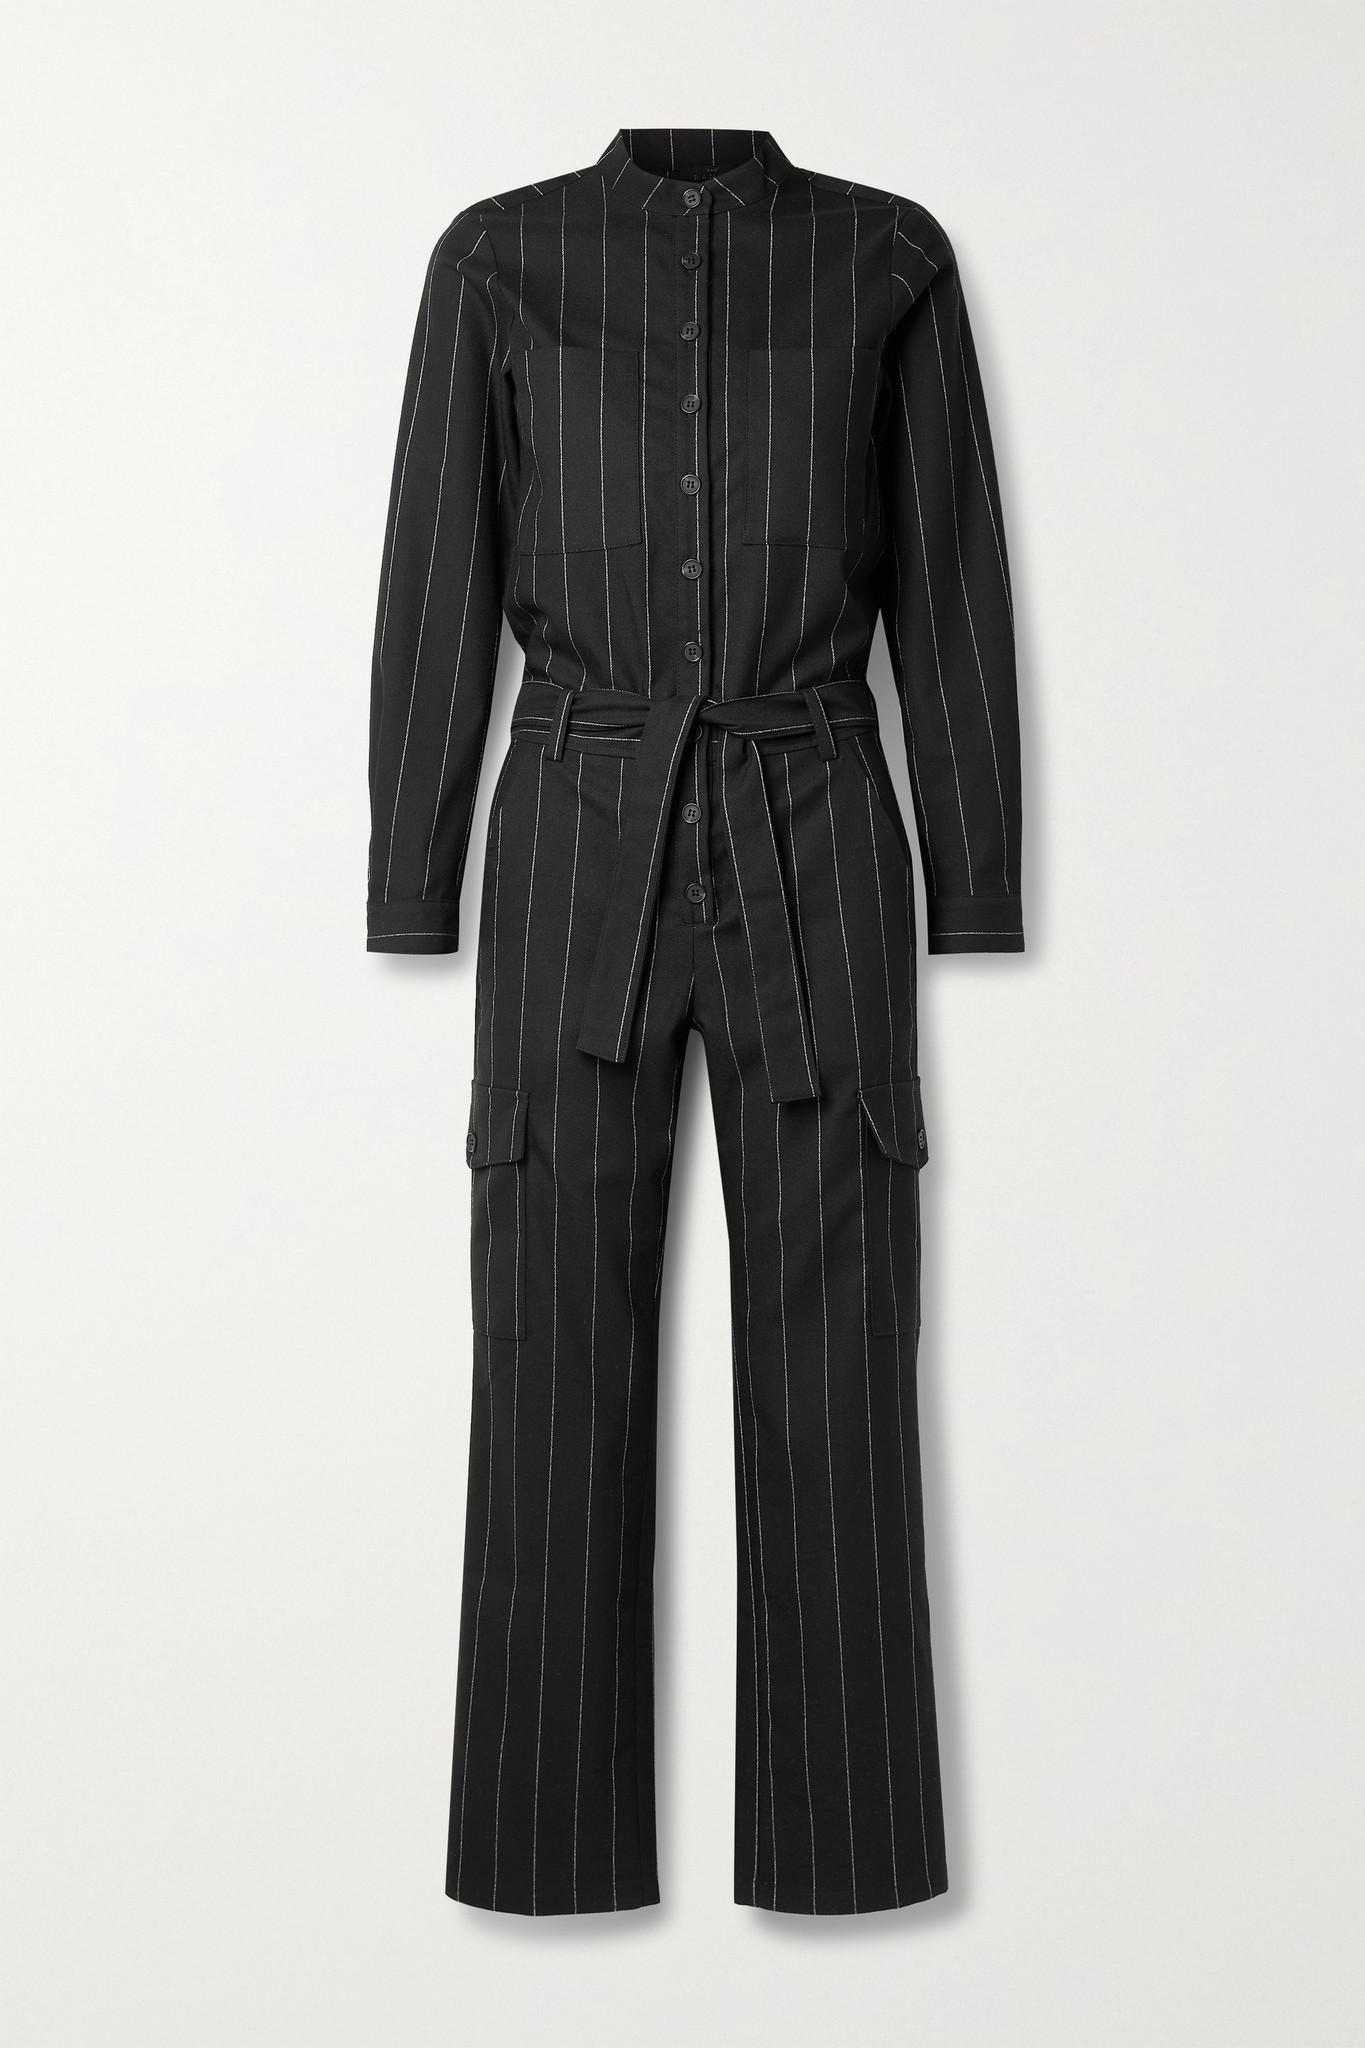 THE RANGE - Zoot 配腰带细条纹绉纱连身裤 - 黑色 - small